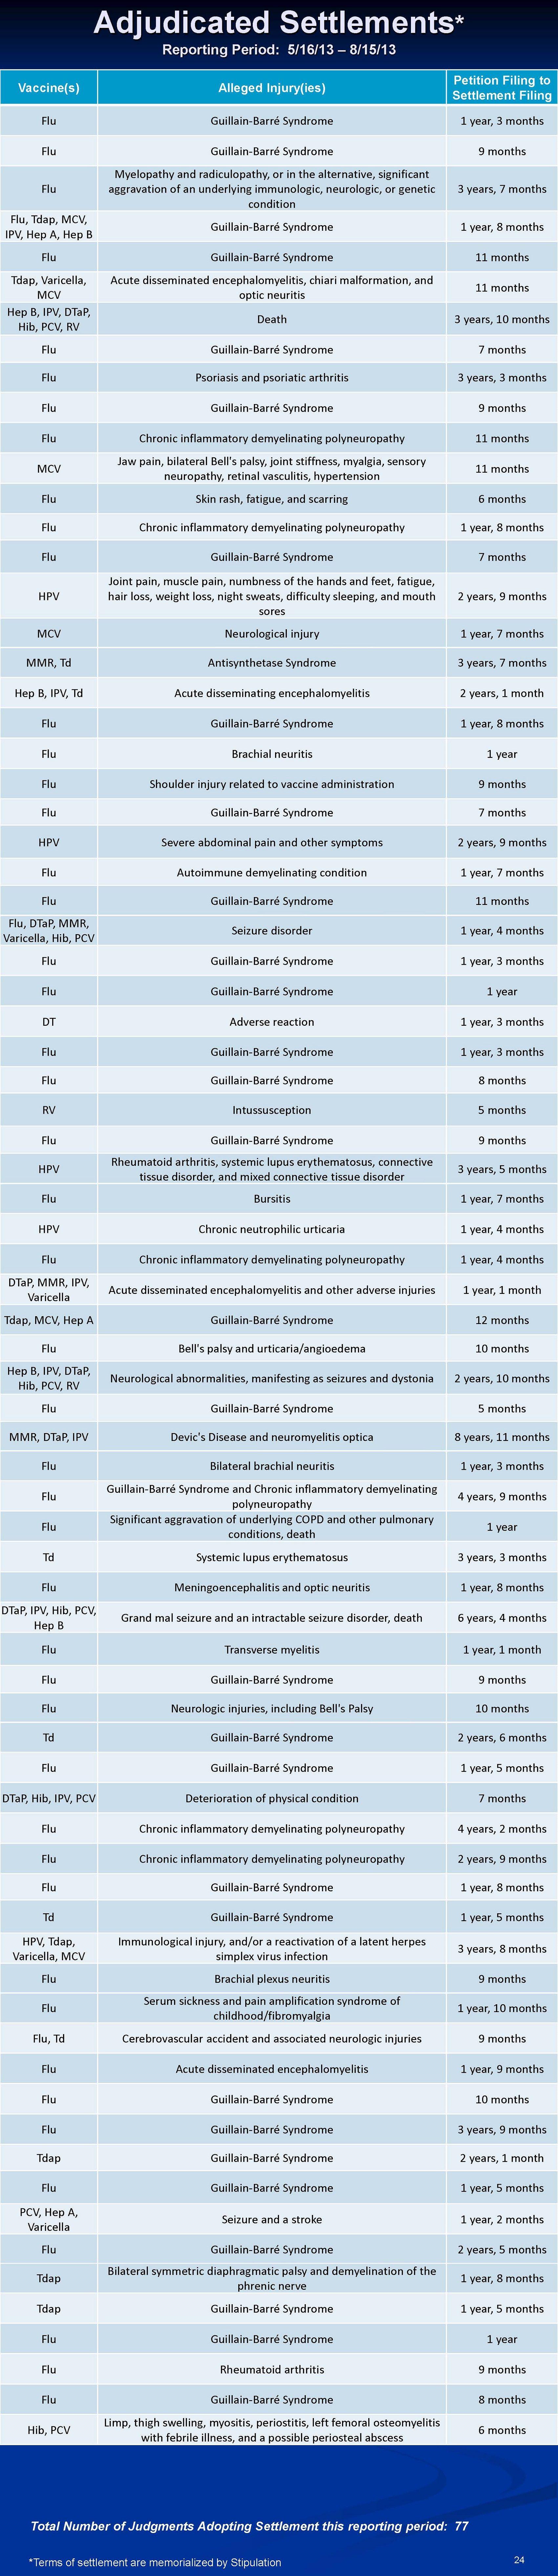 vaccine-settlements-2013